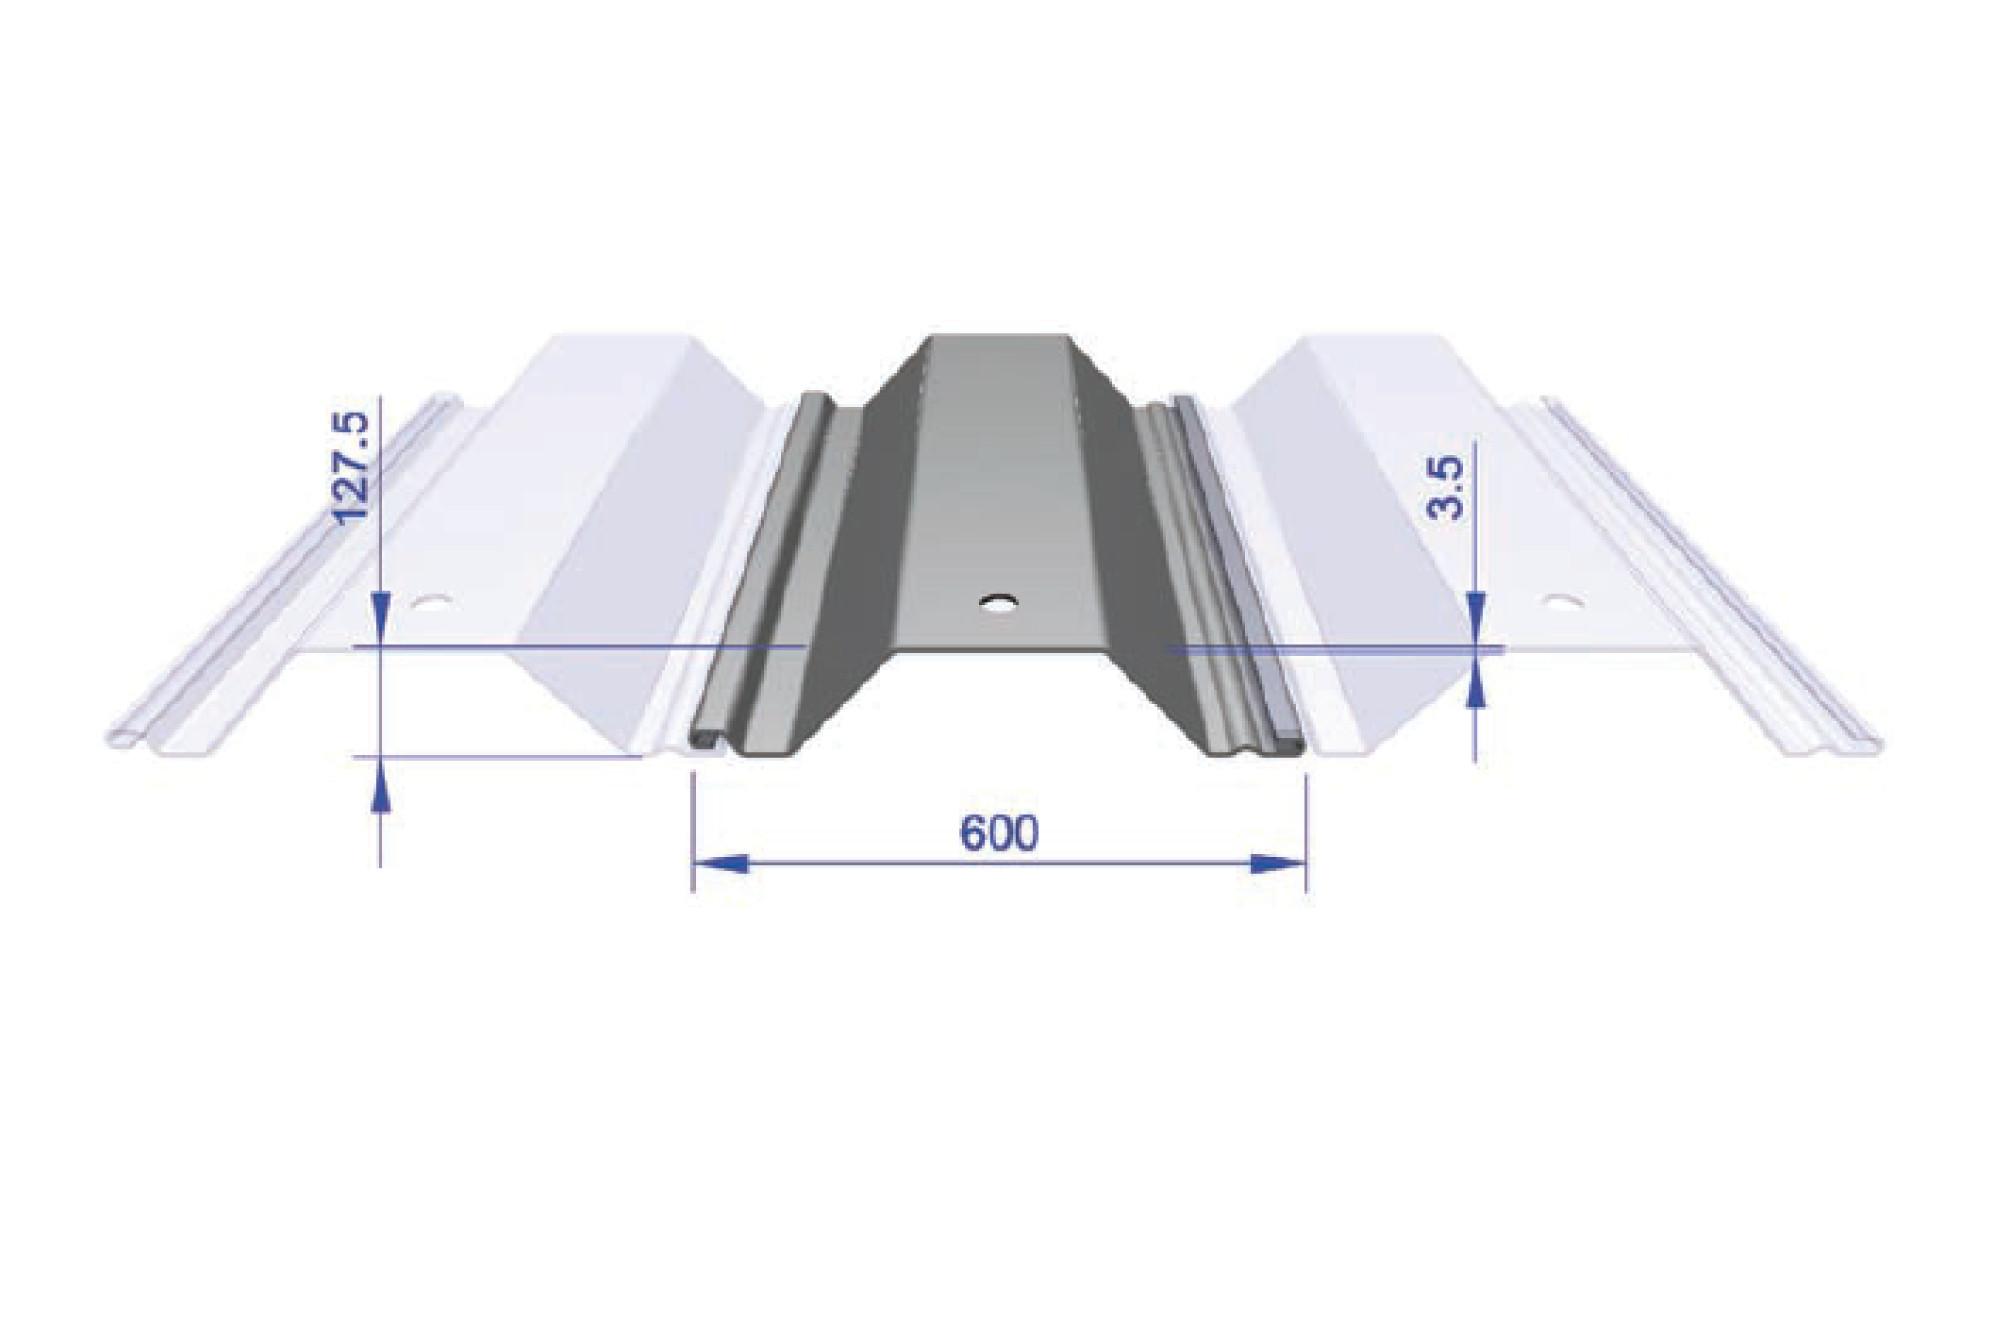 Interlocking Trench Sheet - FLP 600/3.5 600mm Wide